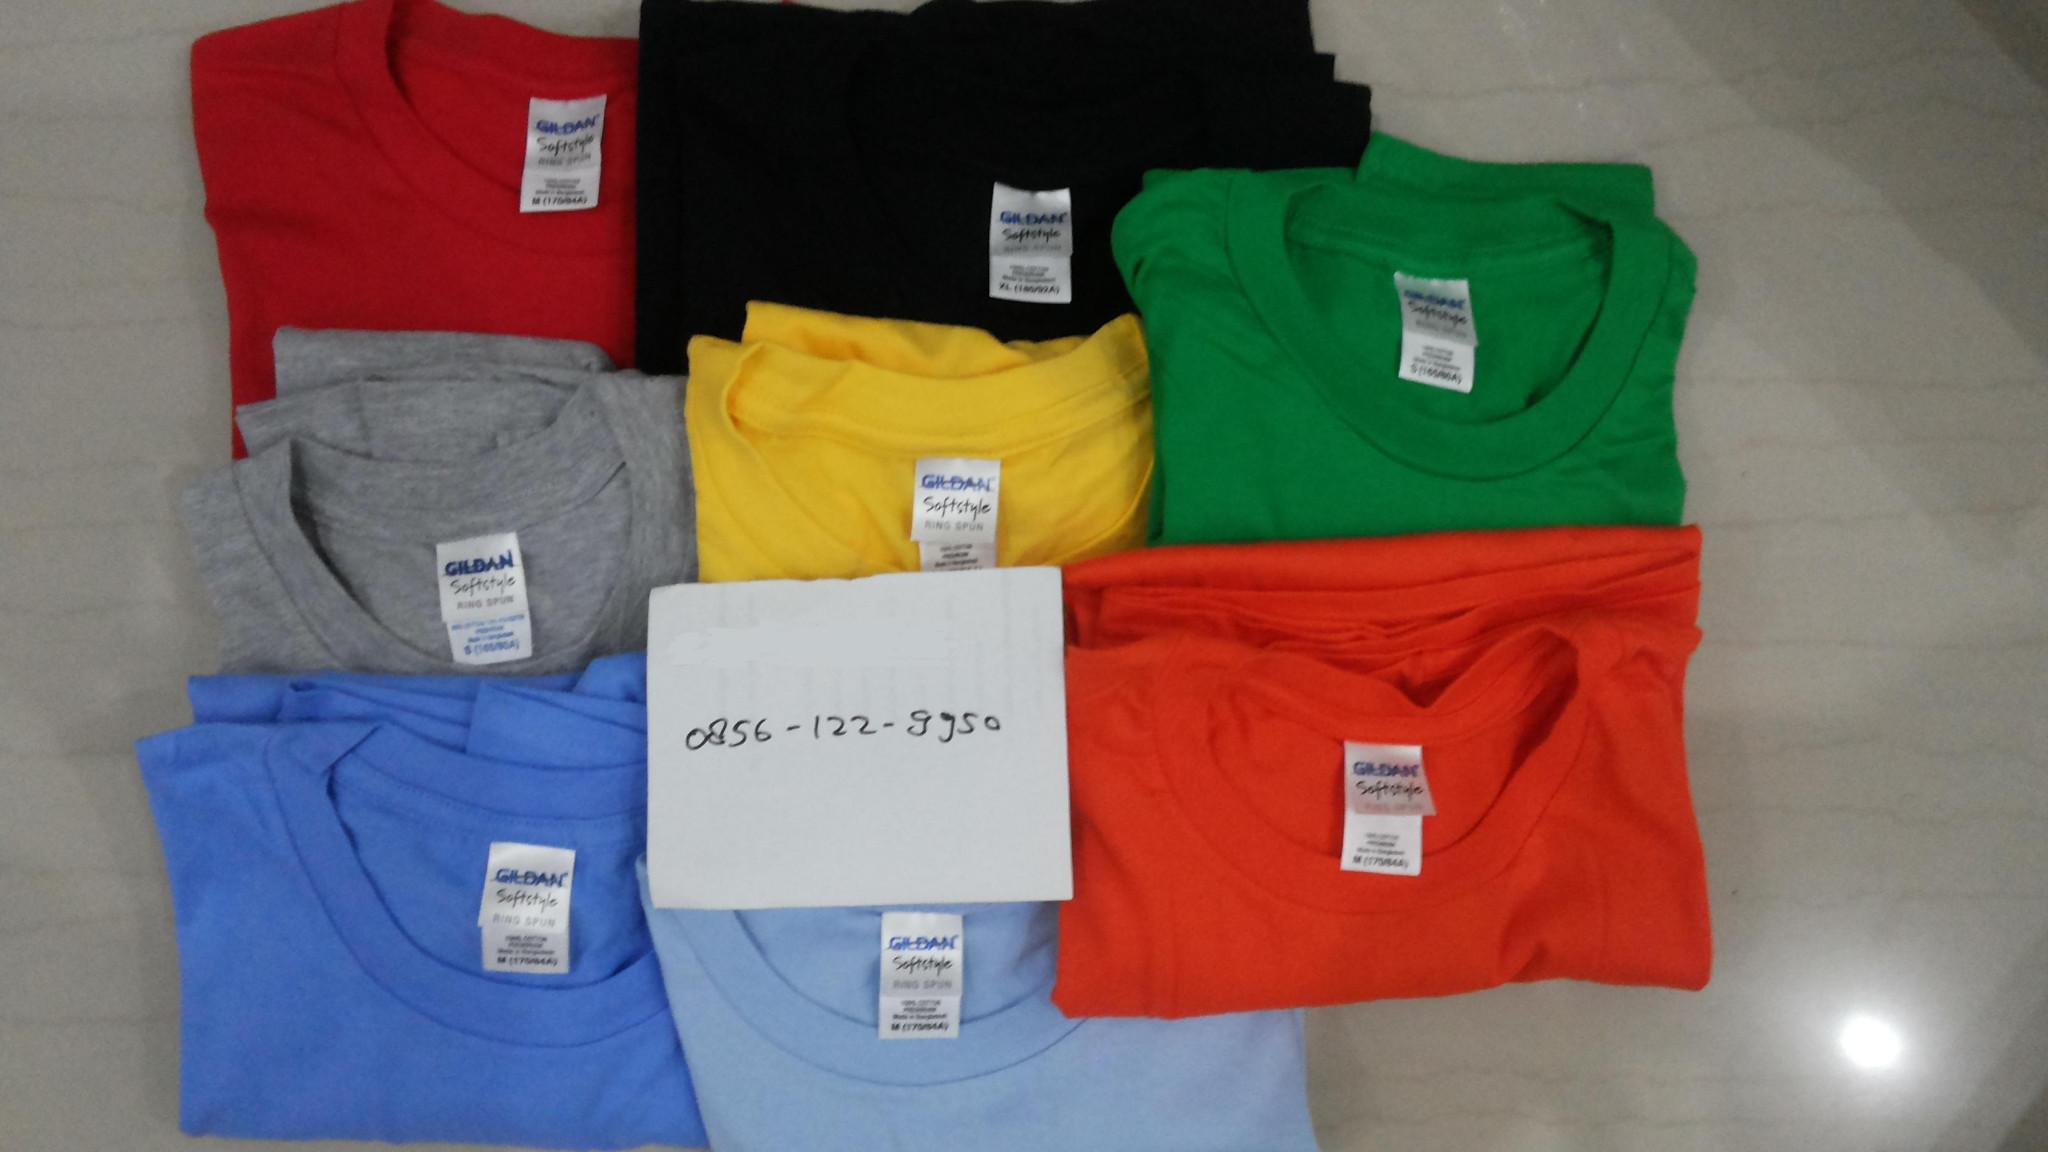 Gildan Softstyle 63000 Kaos Polos Hitam Daftar Harga Terbaru Original Xs S M L Xl Sapphire Update Source Jual